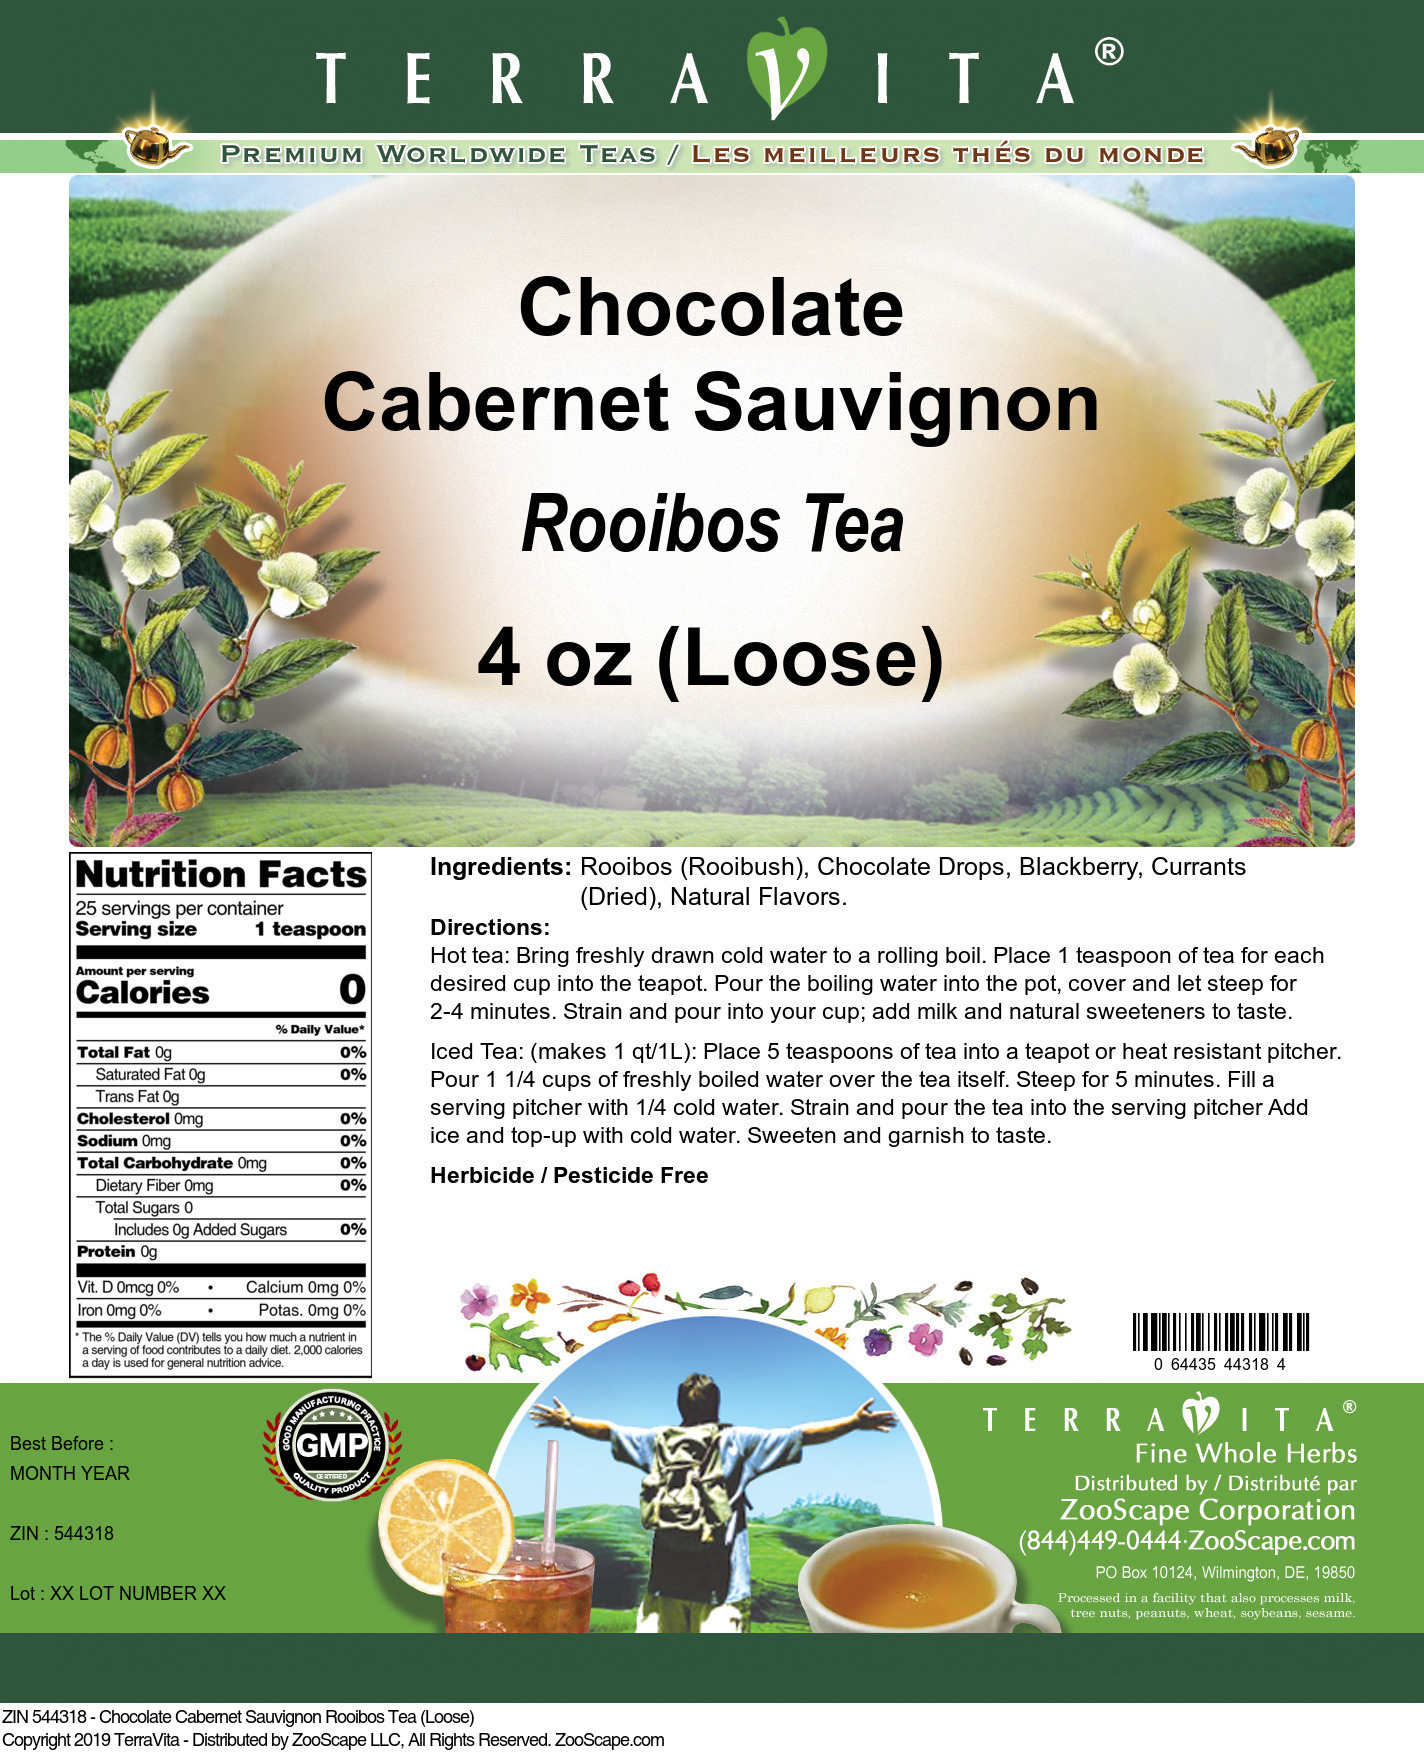 Chocolate Cabernet Sauvignon Rooibos Tea (Loose)